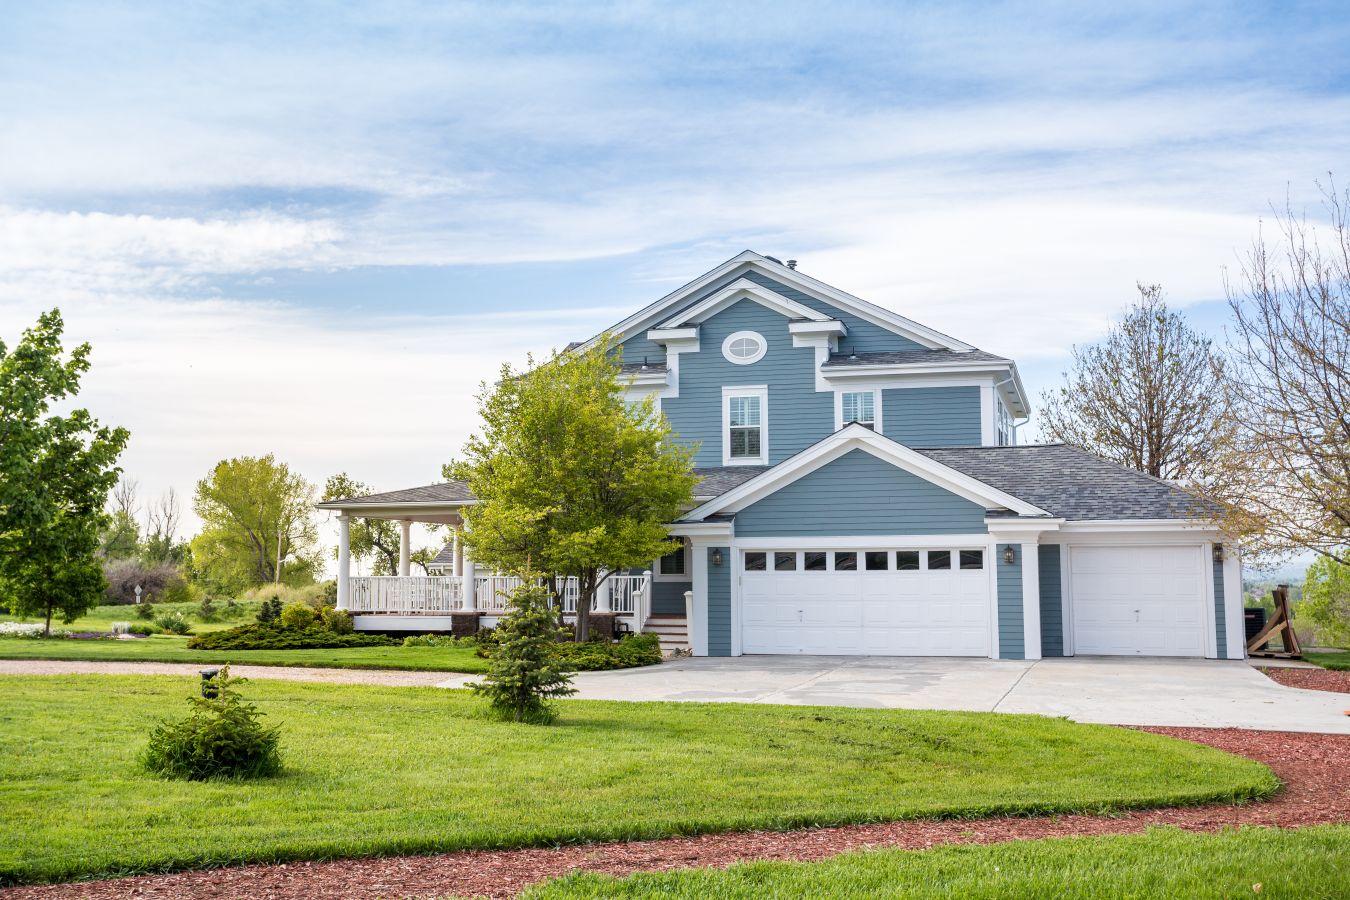 maison assurance habitation gatineau